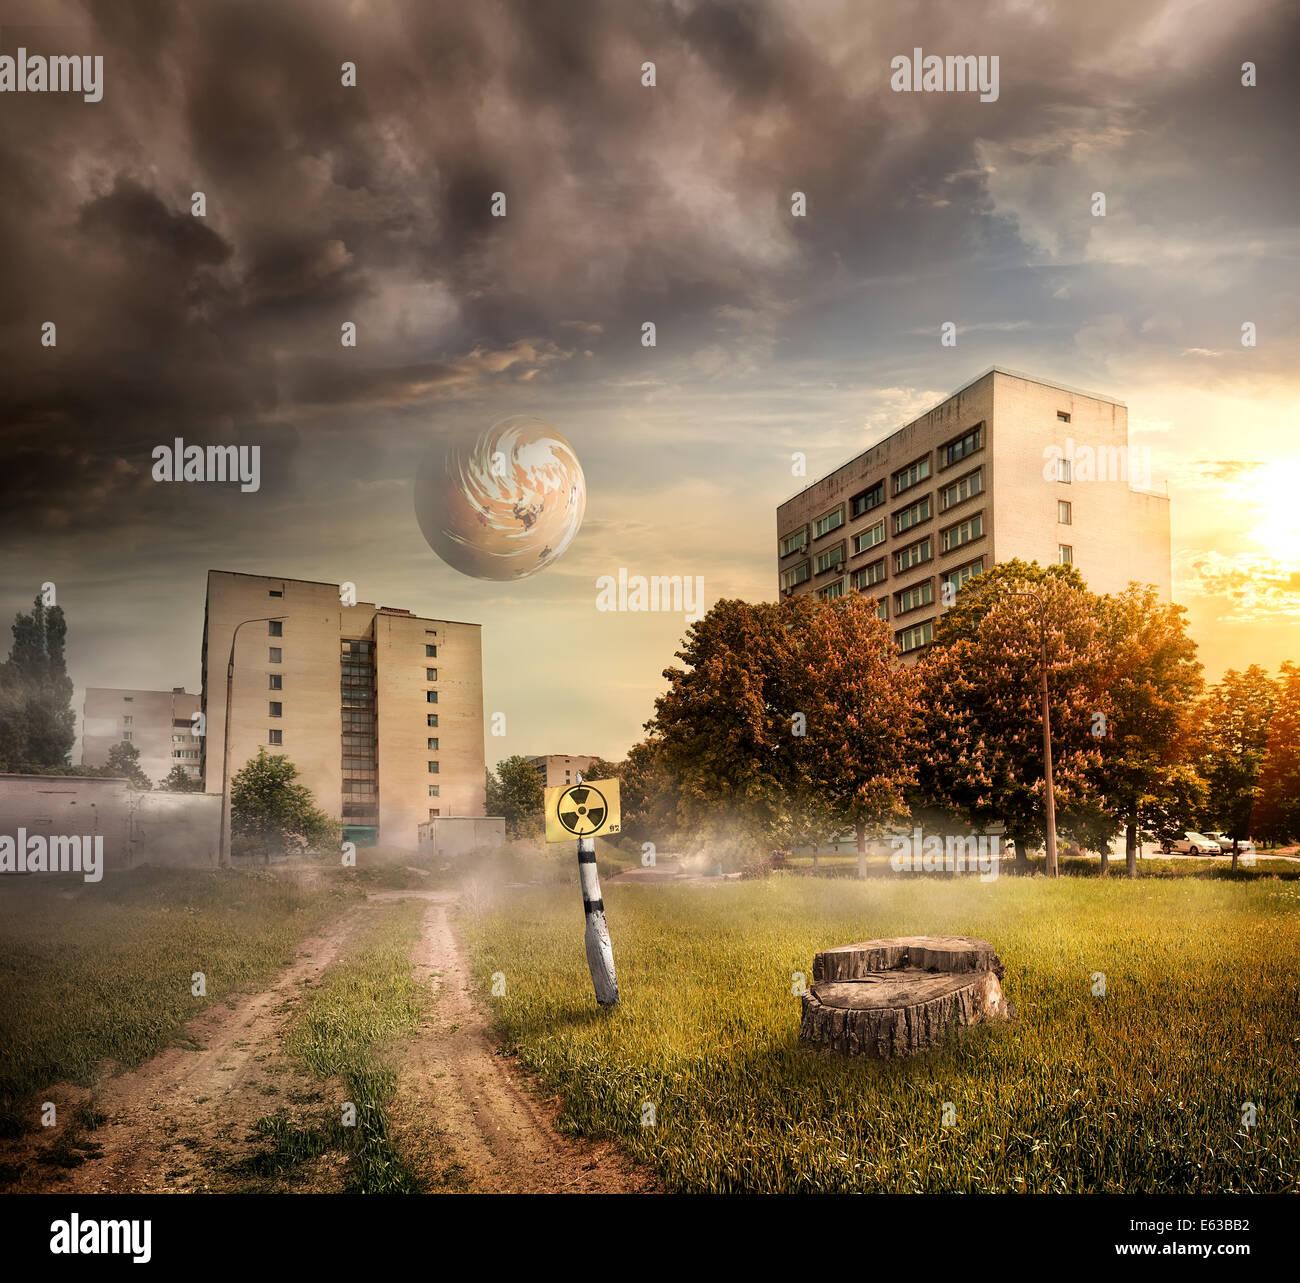 Fantastic landscape. City after radioactive contamination - Stock Image